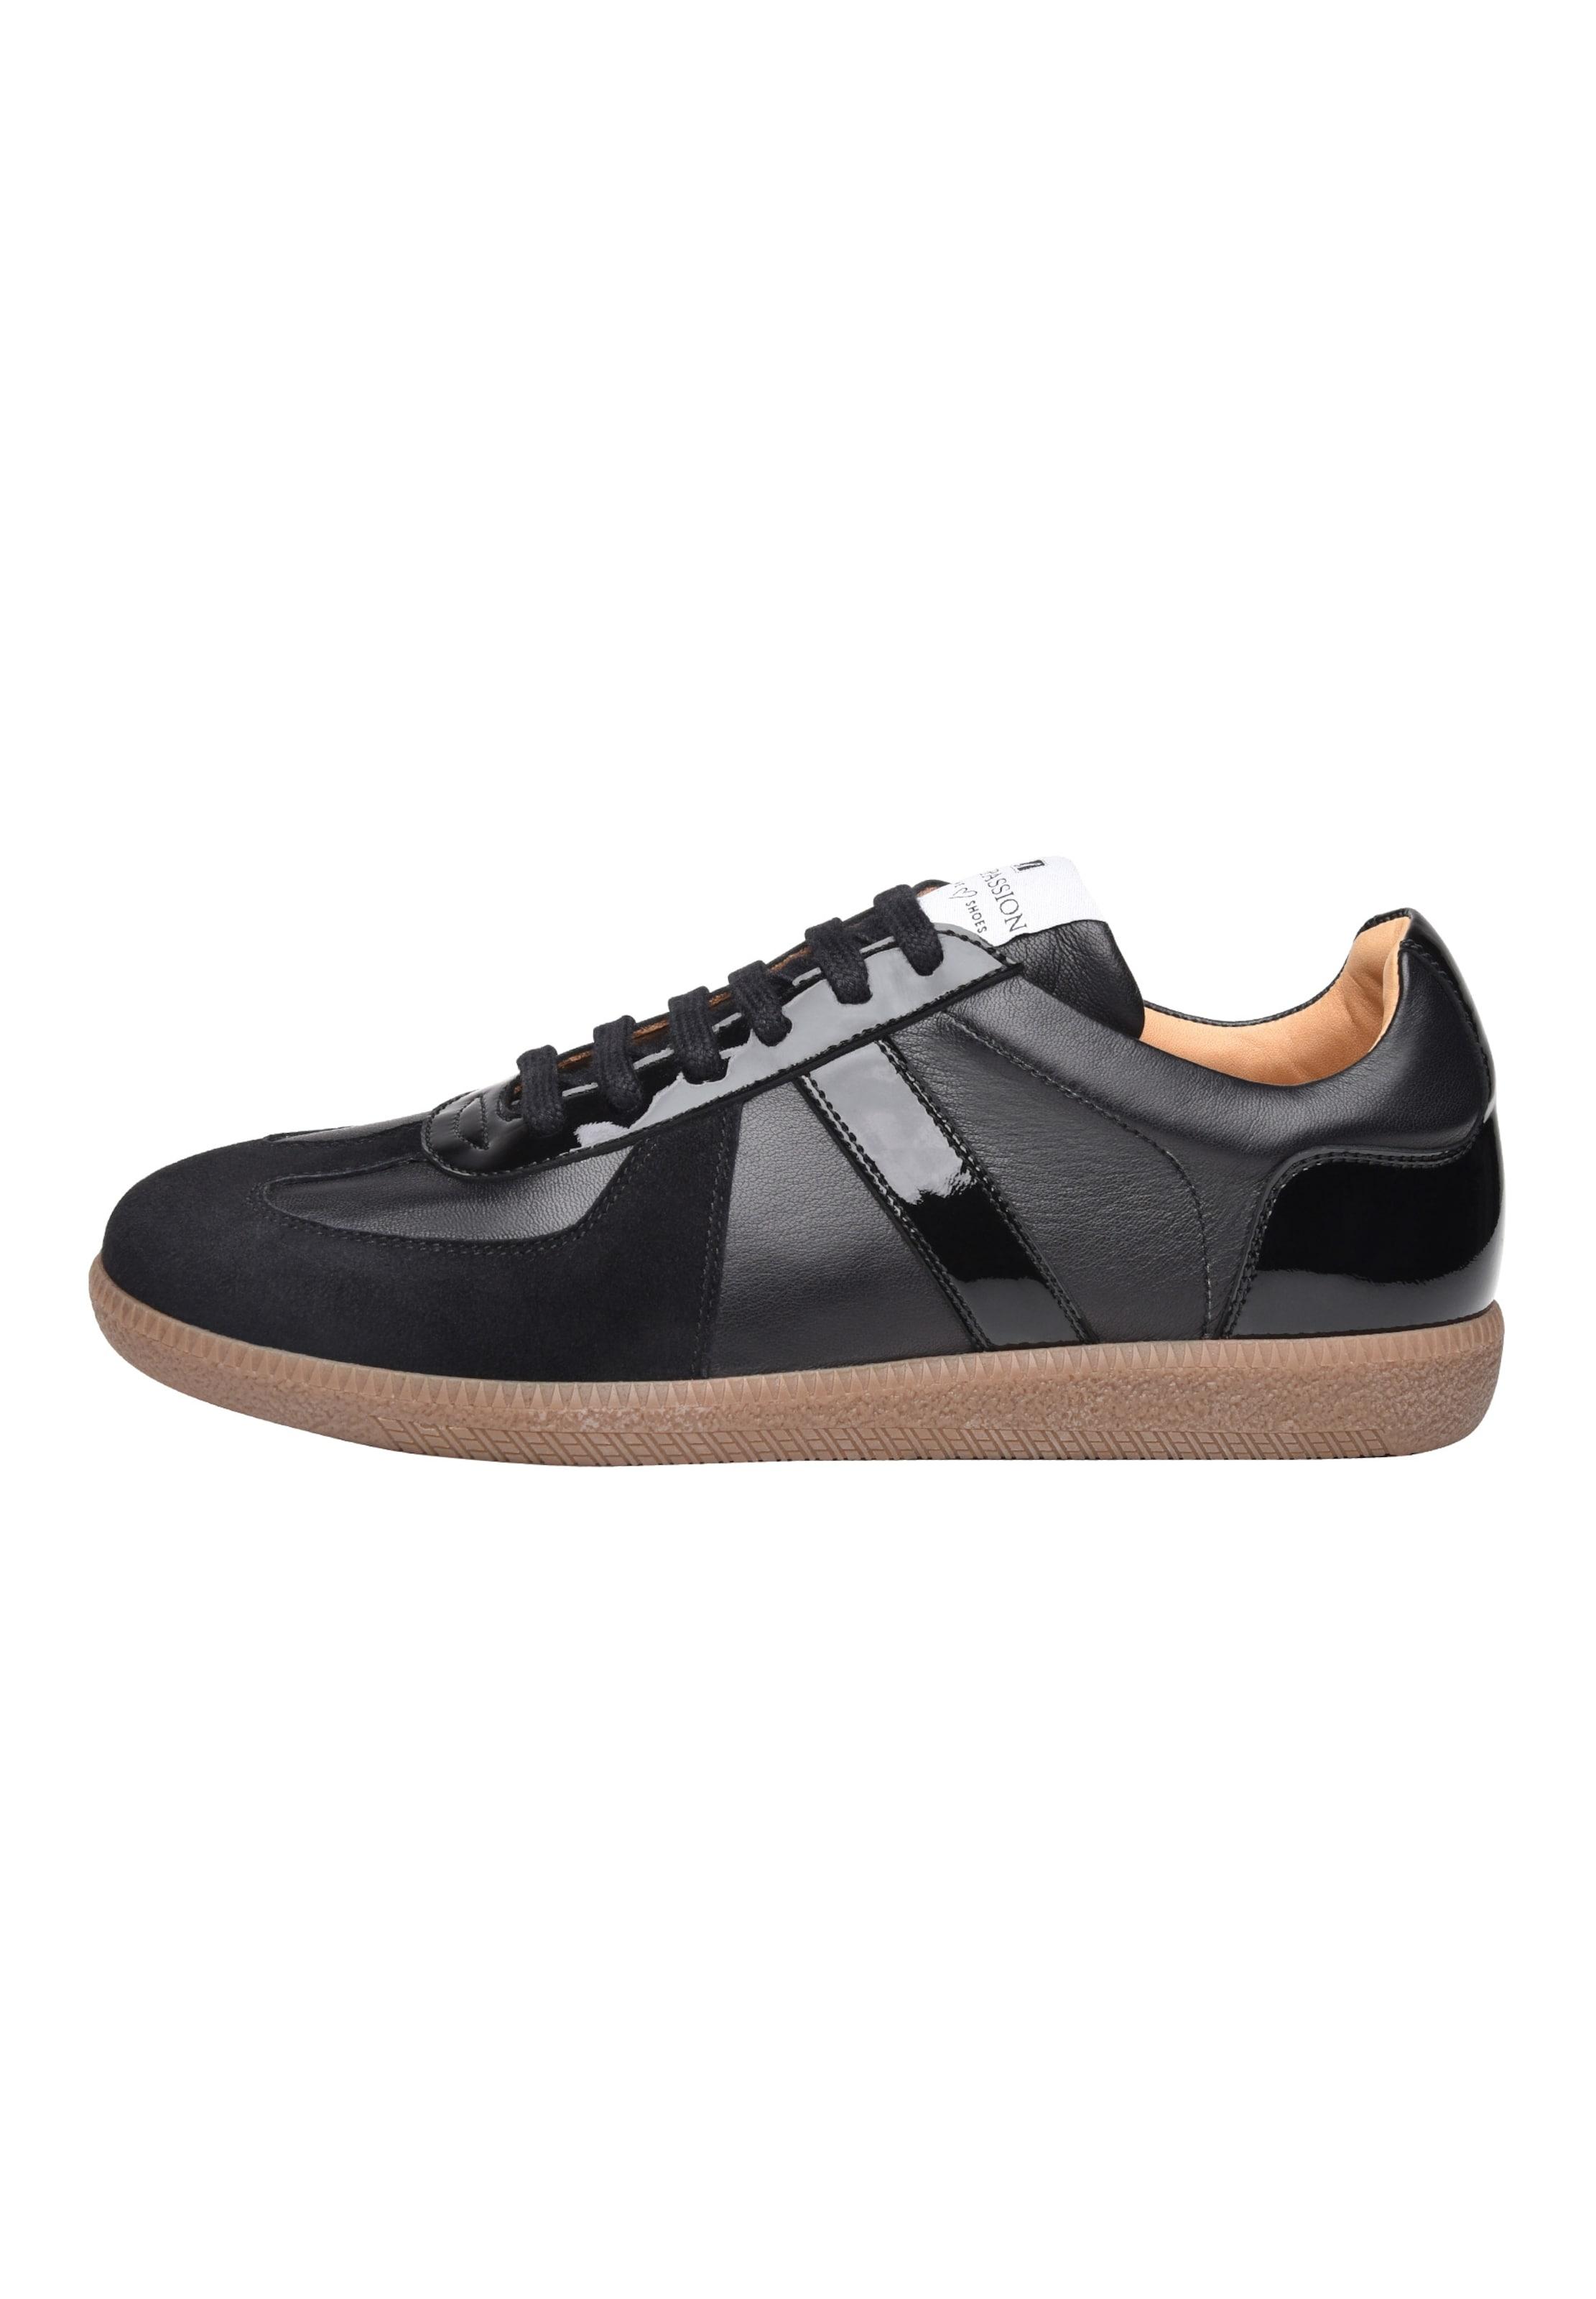 Shoepassion Schwarz Ws' Sneaker 'no62 In OPkuZiwXT